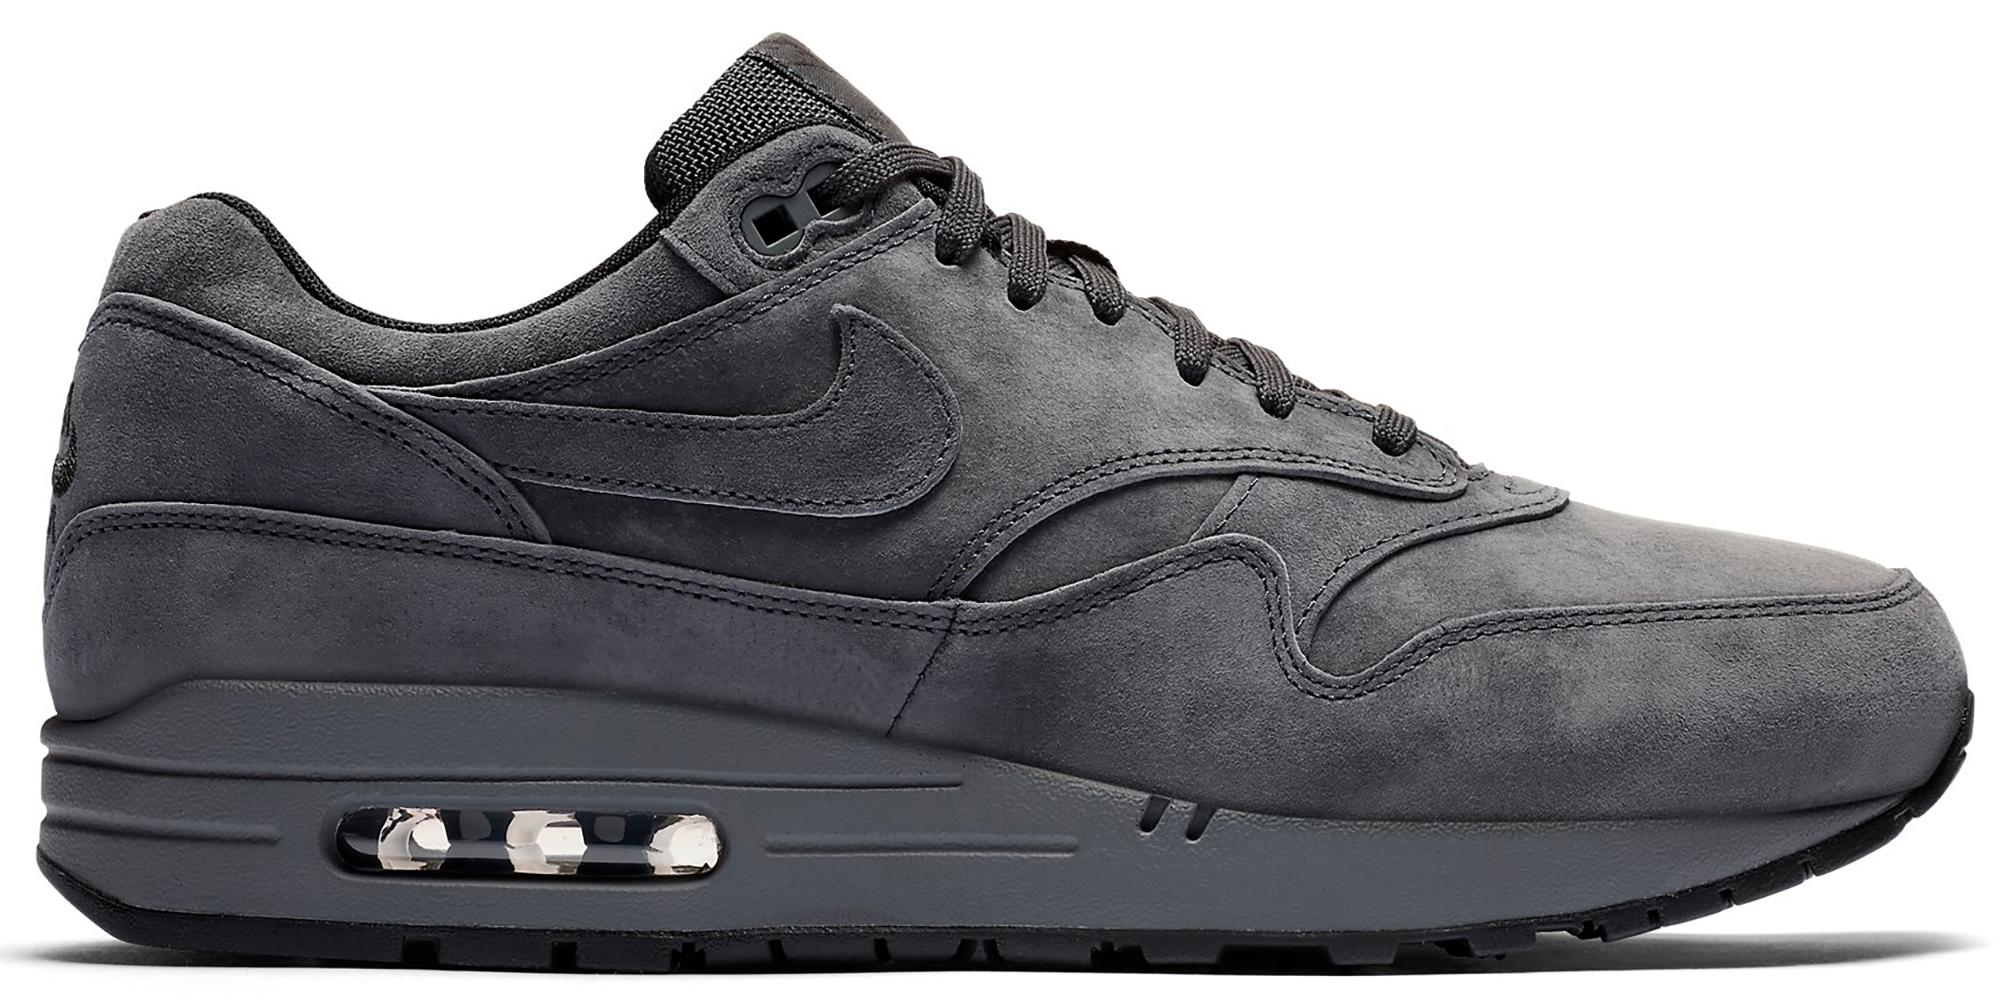 Nike Air Max 1 Anthracite - 875844-010